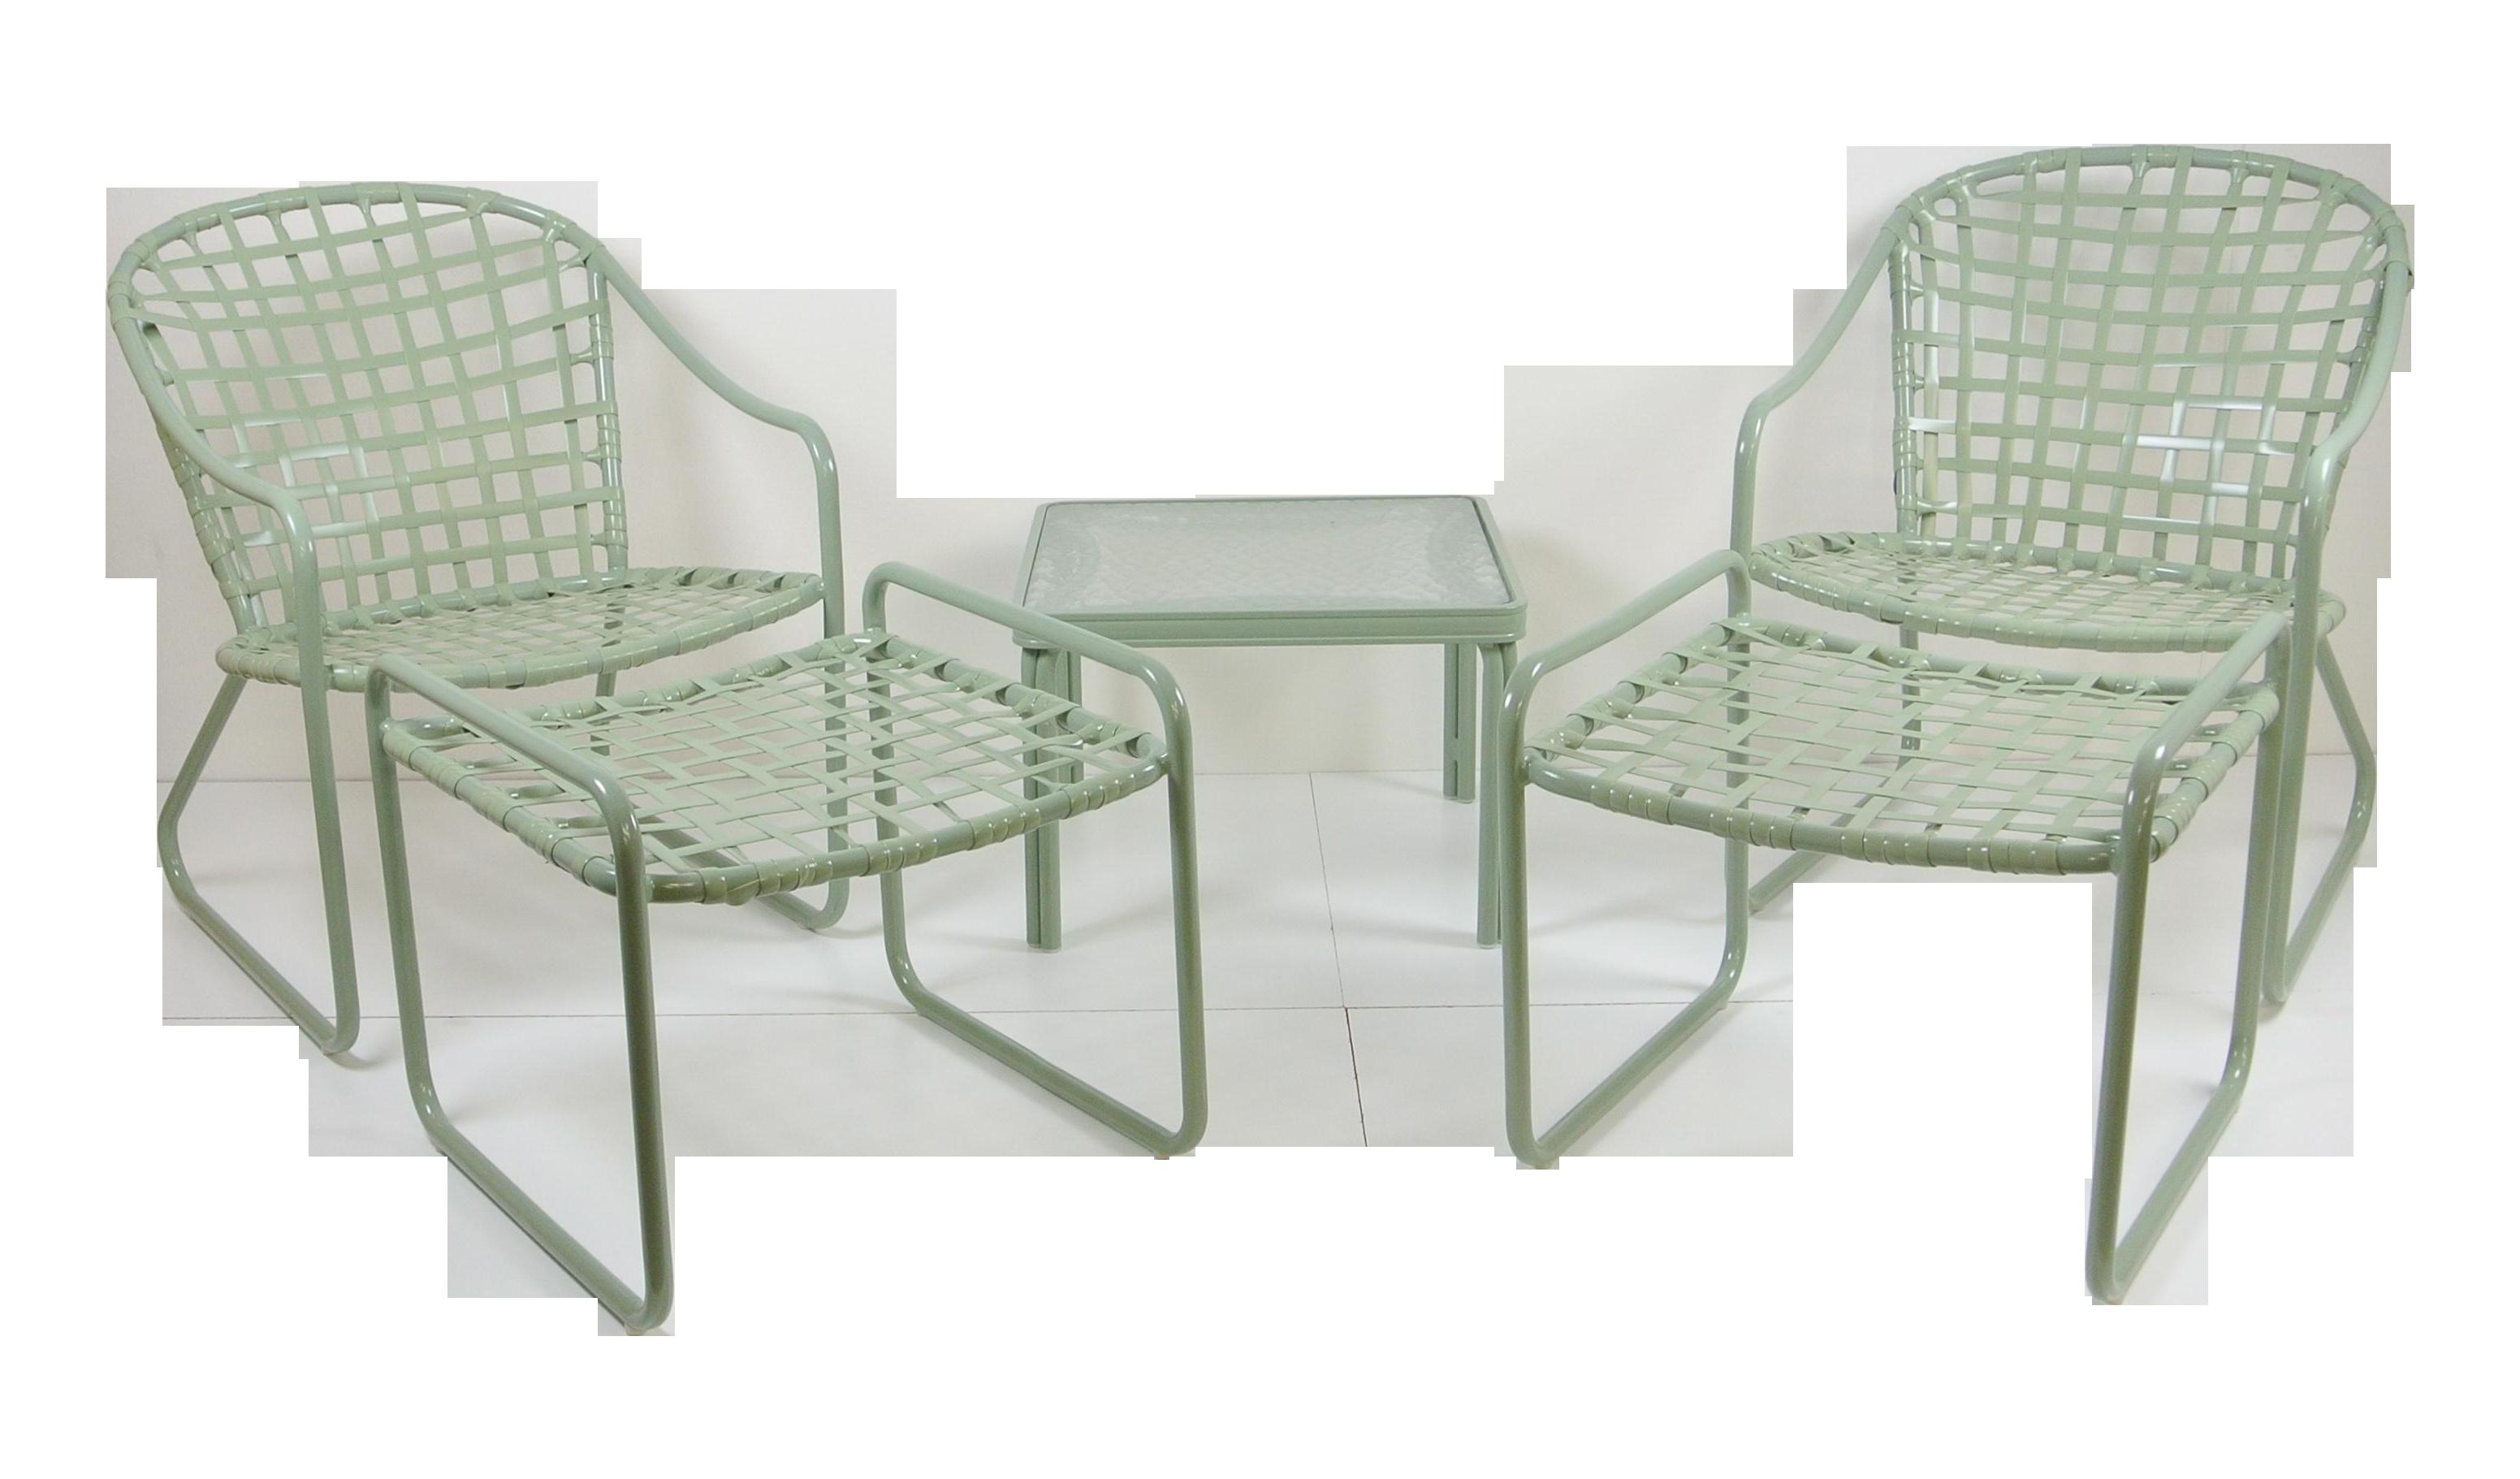 Vintage patio furniture sets - Image Of Brown Jordan Vintage Patio Furniture Set Of 5